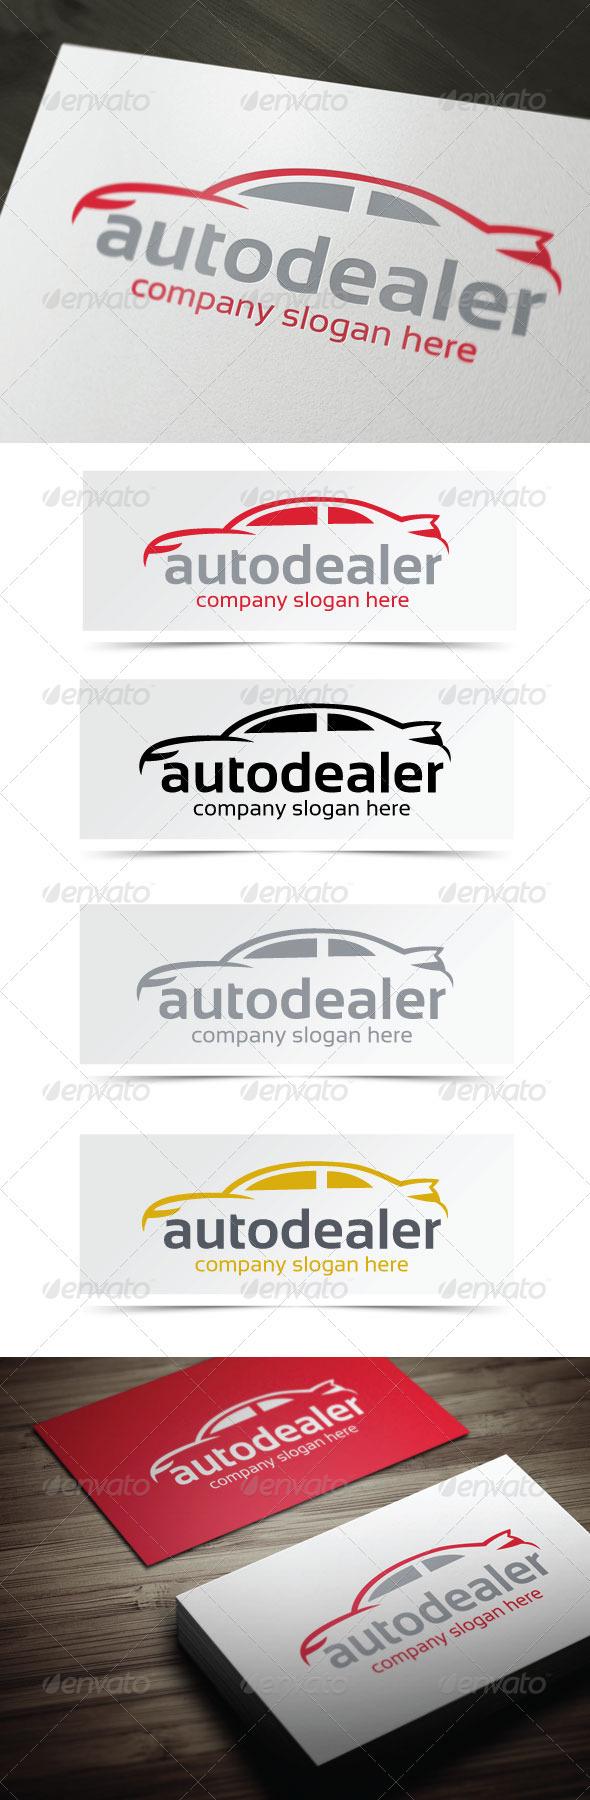 GraphicRiver Auto Dealer 3966038